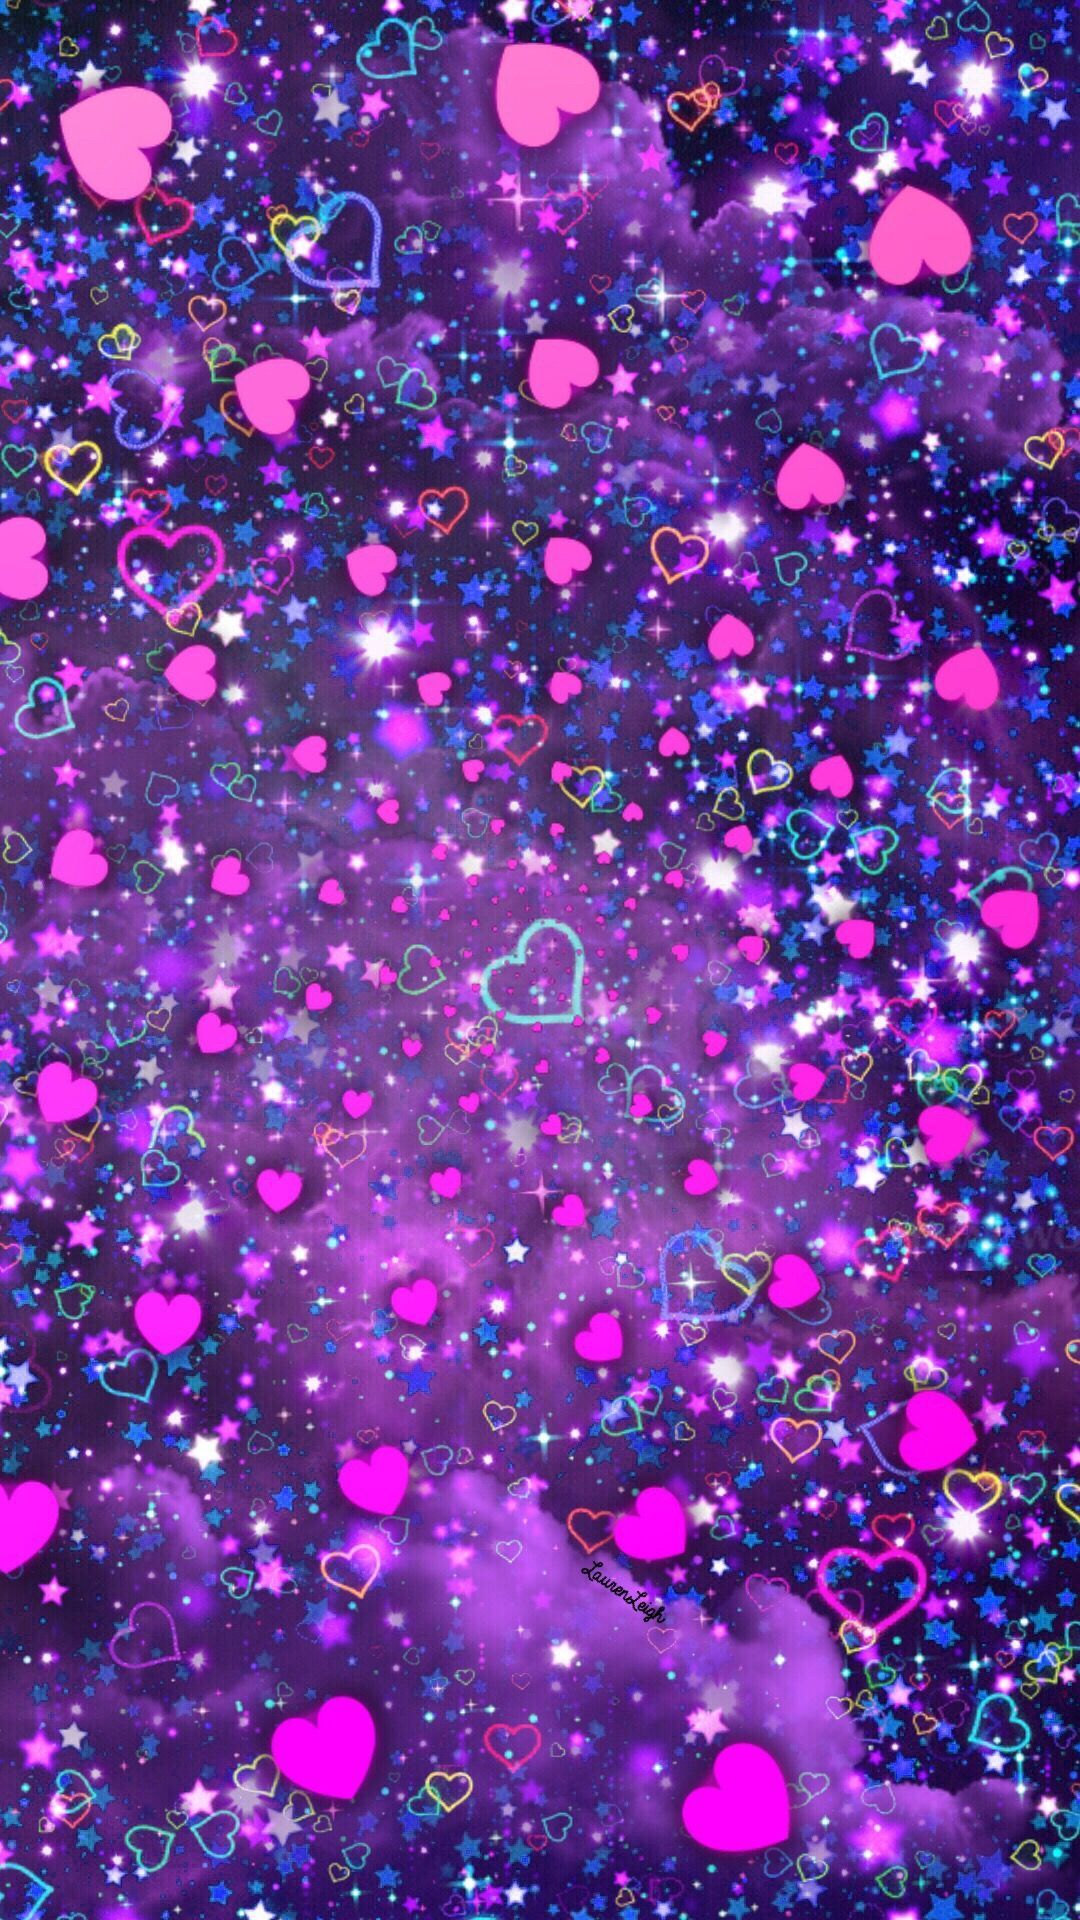 New Heart Wallpaper Download Free 4k Hd Wallpapers Lockscreens Heart Wallpaper Love Wallpaper Glitter Wallpaper